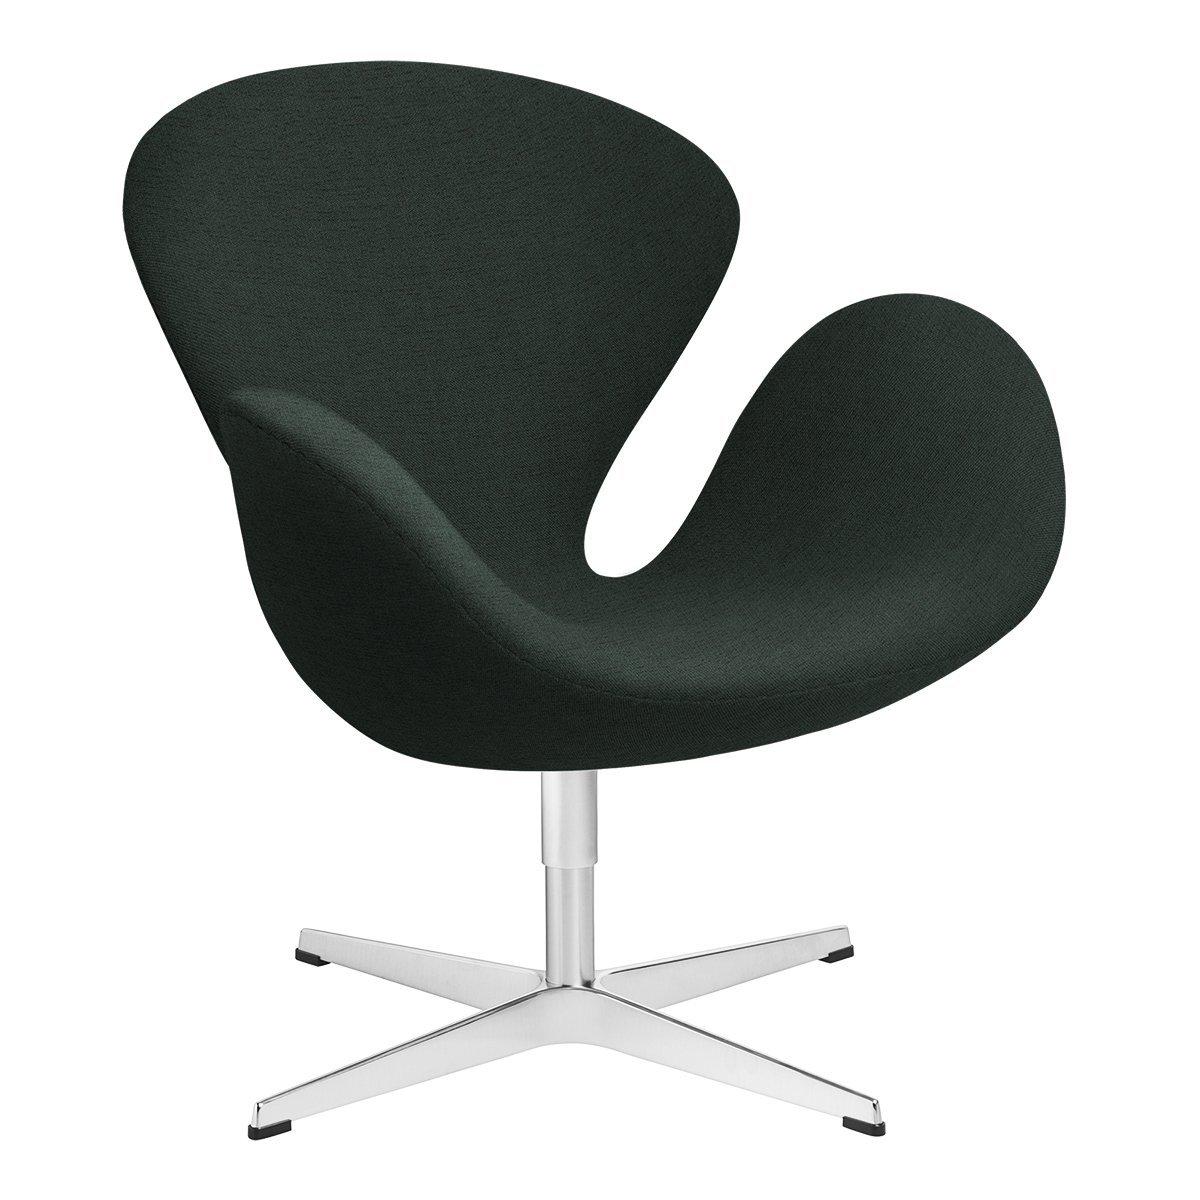 Fritz Hansen Swan Chair - Christianshavn 1161 Groen